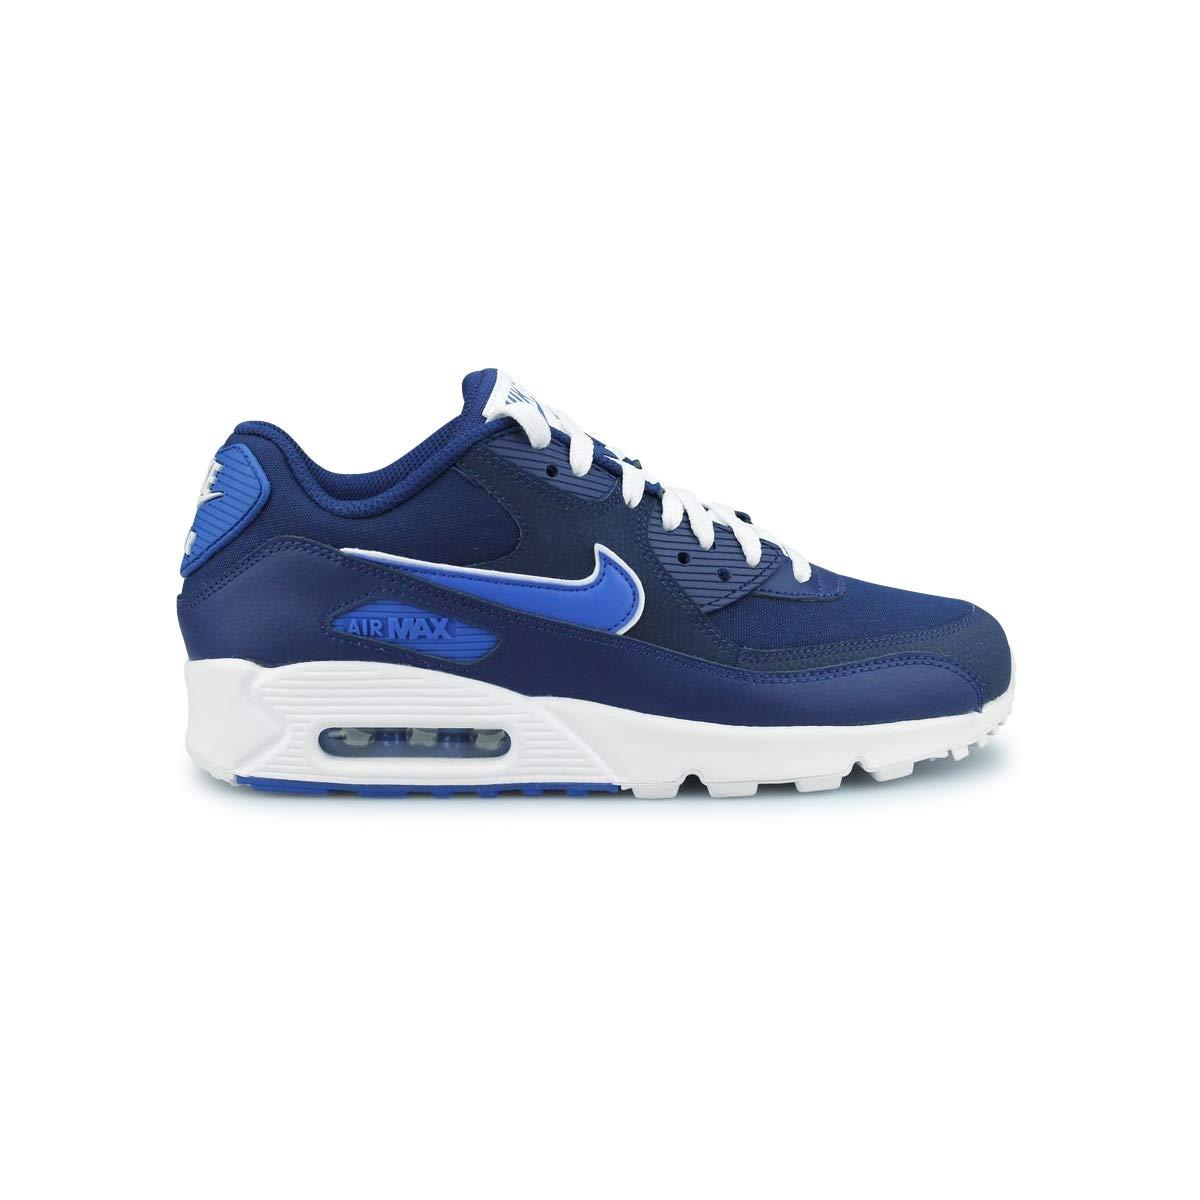 meet 1ae69 f6d68 NIKE Men s Air Max 90 Essential Gymnastics Shoes AJ1285